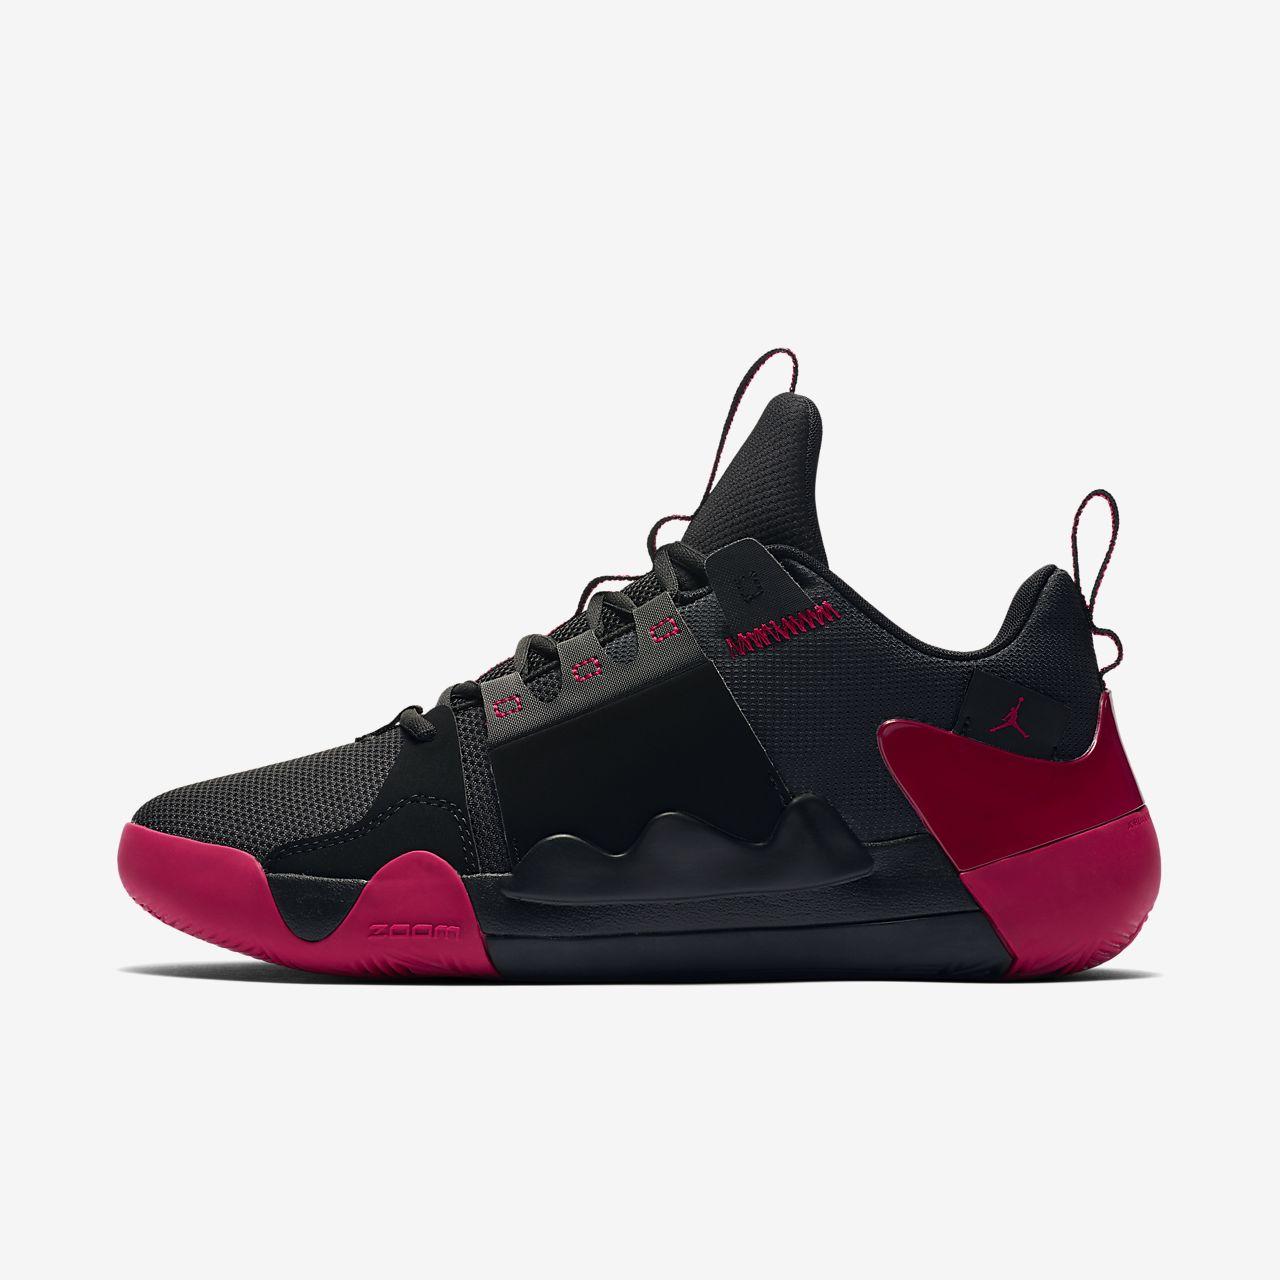 Jordan Zoom Zero Gravity Basketballschuh